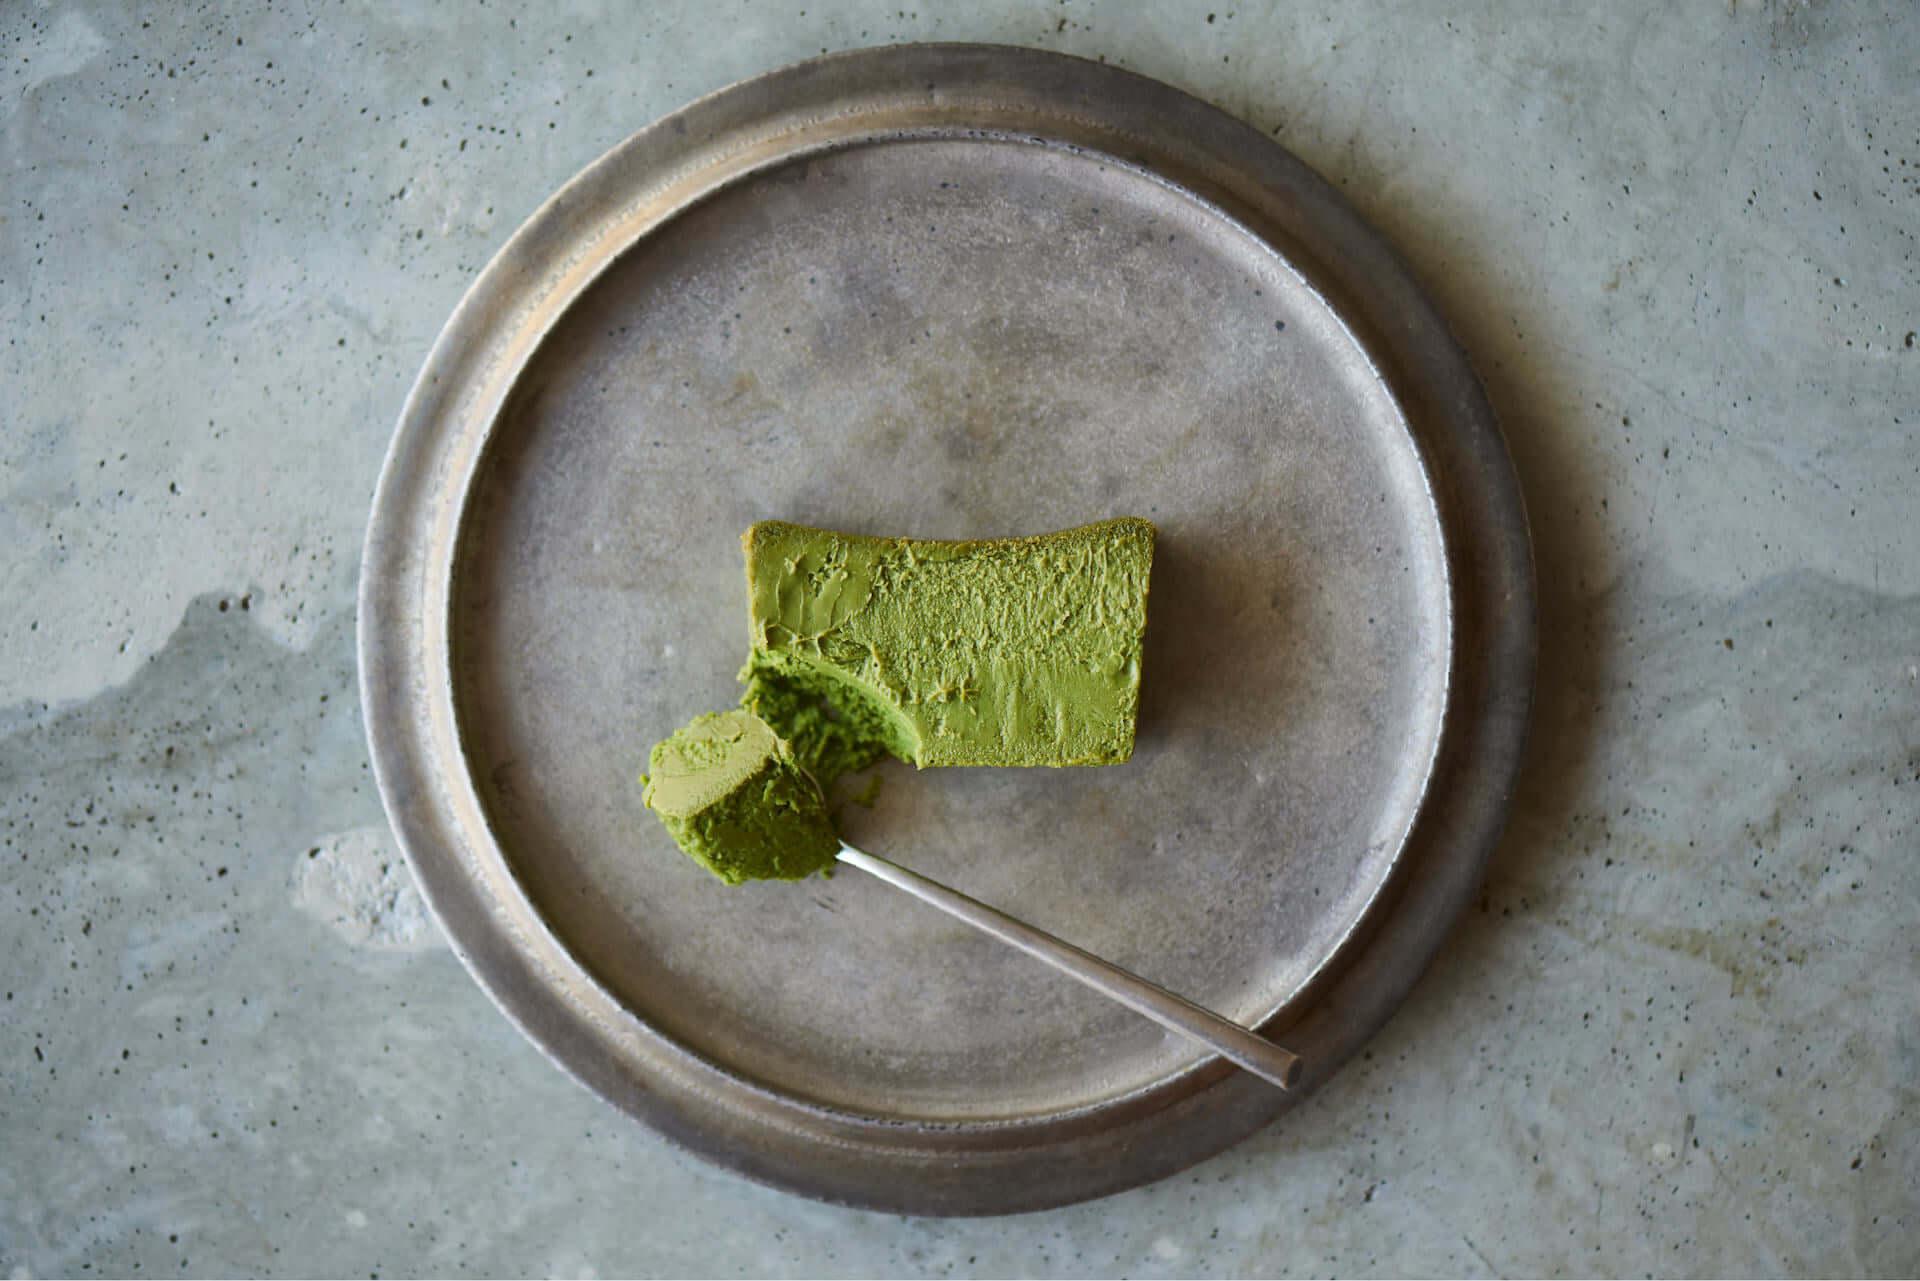 Mr. CHEESECAKE誕生3周年記念!希少な抹茶を使用したチーズケーキ『Mr. CHEESECAKE Oribe』が数量限定で登場 gourmet210322_mrcheesecake-tearoom_14-1920x1281